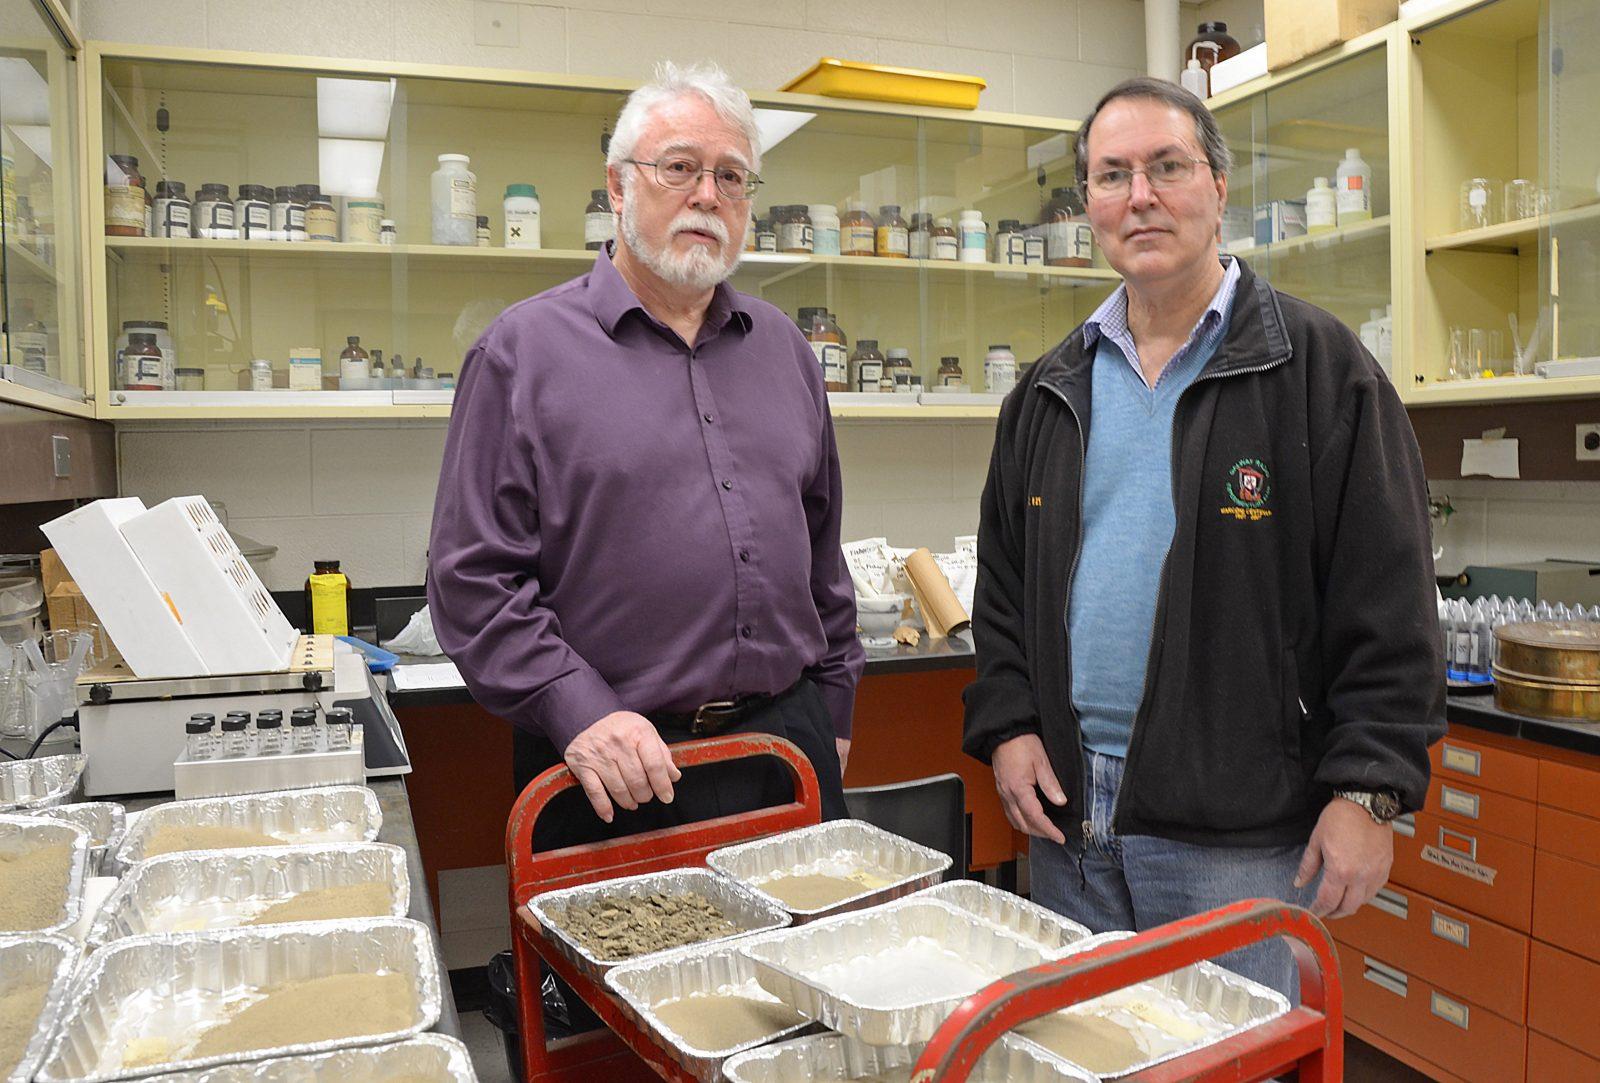 Uwe Brand and Nigel Blamey